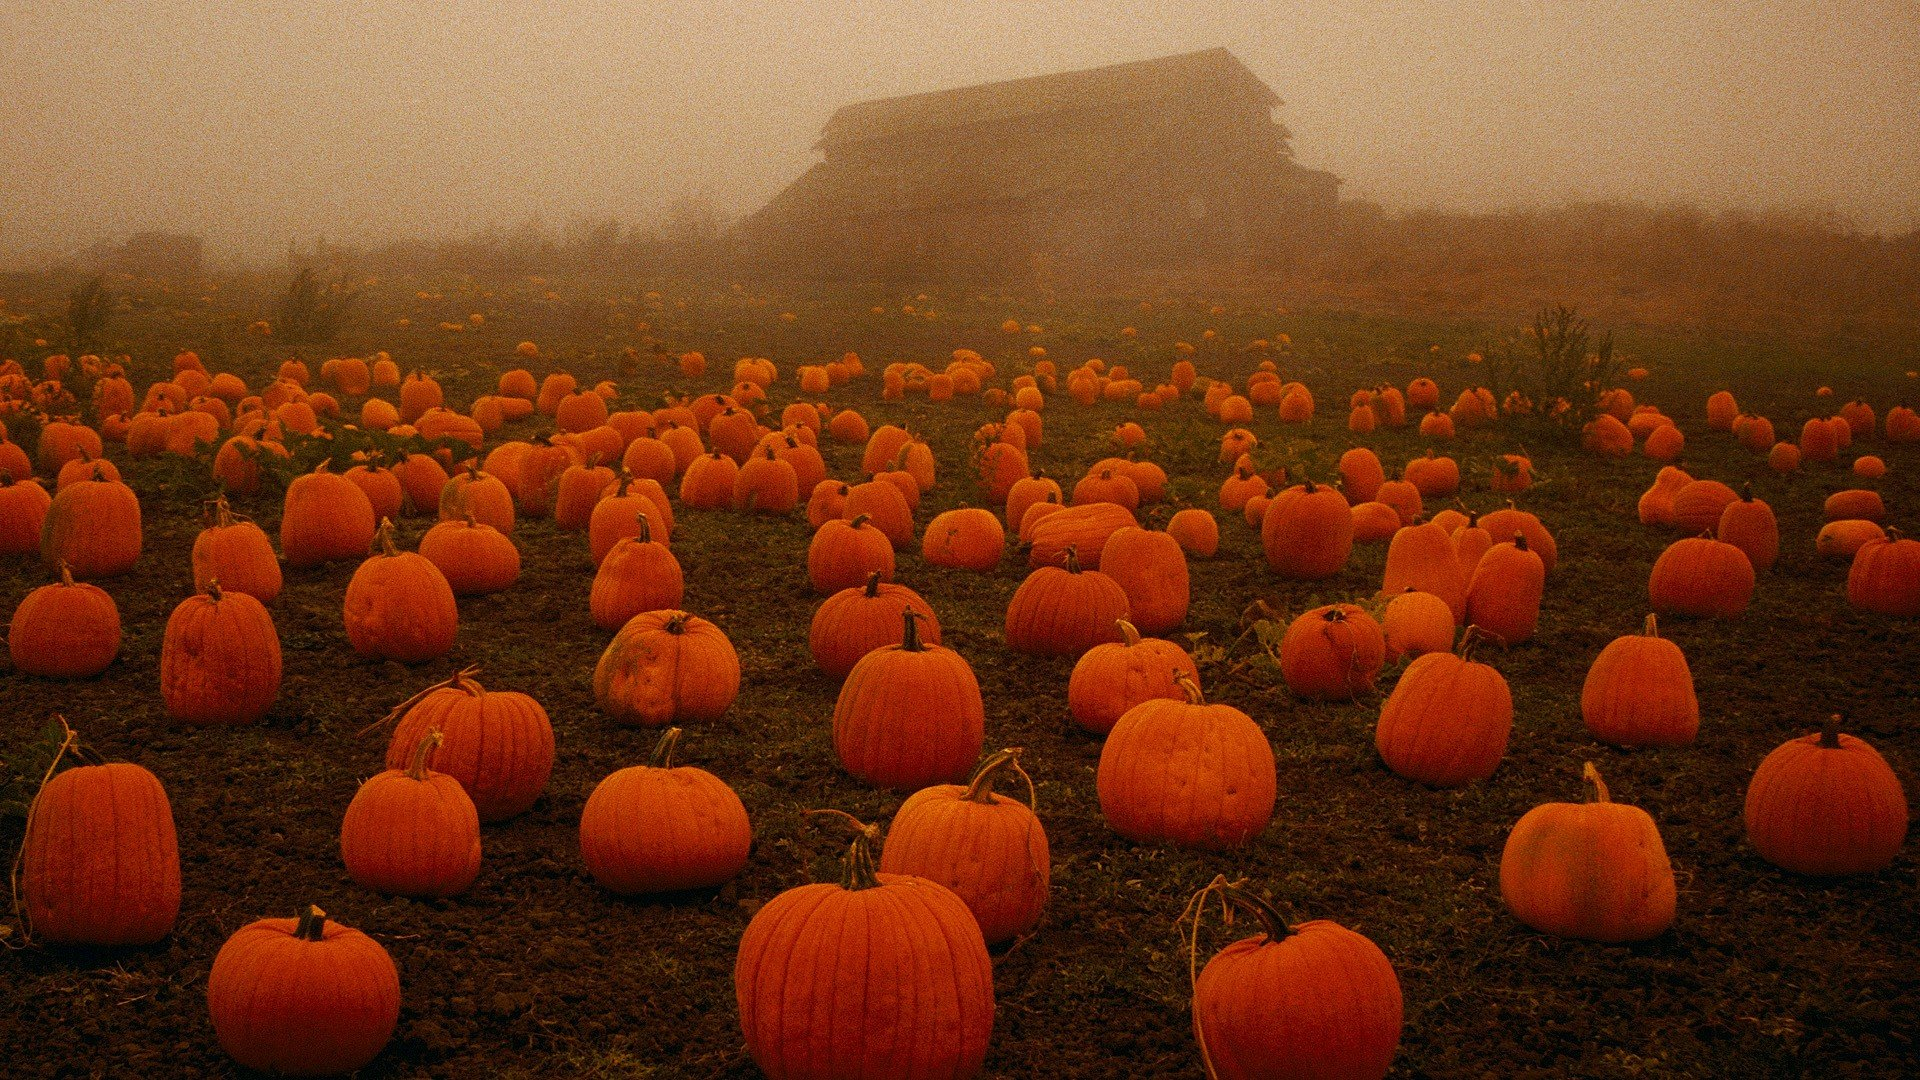 fall wallpaper pumpkins